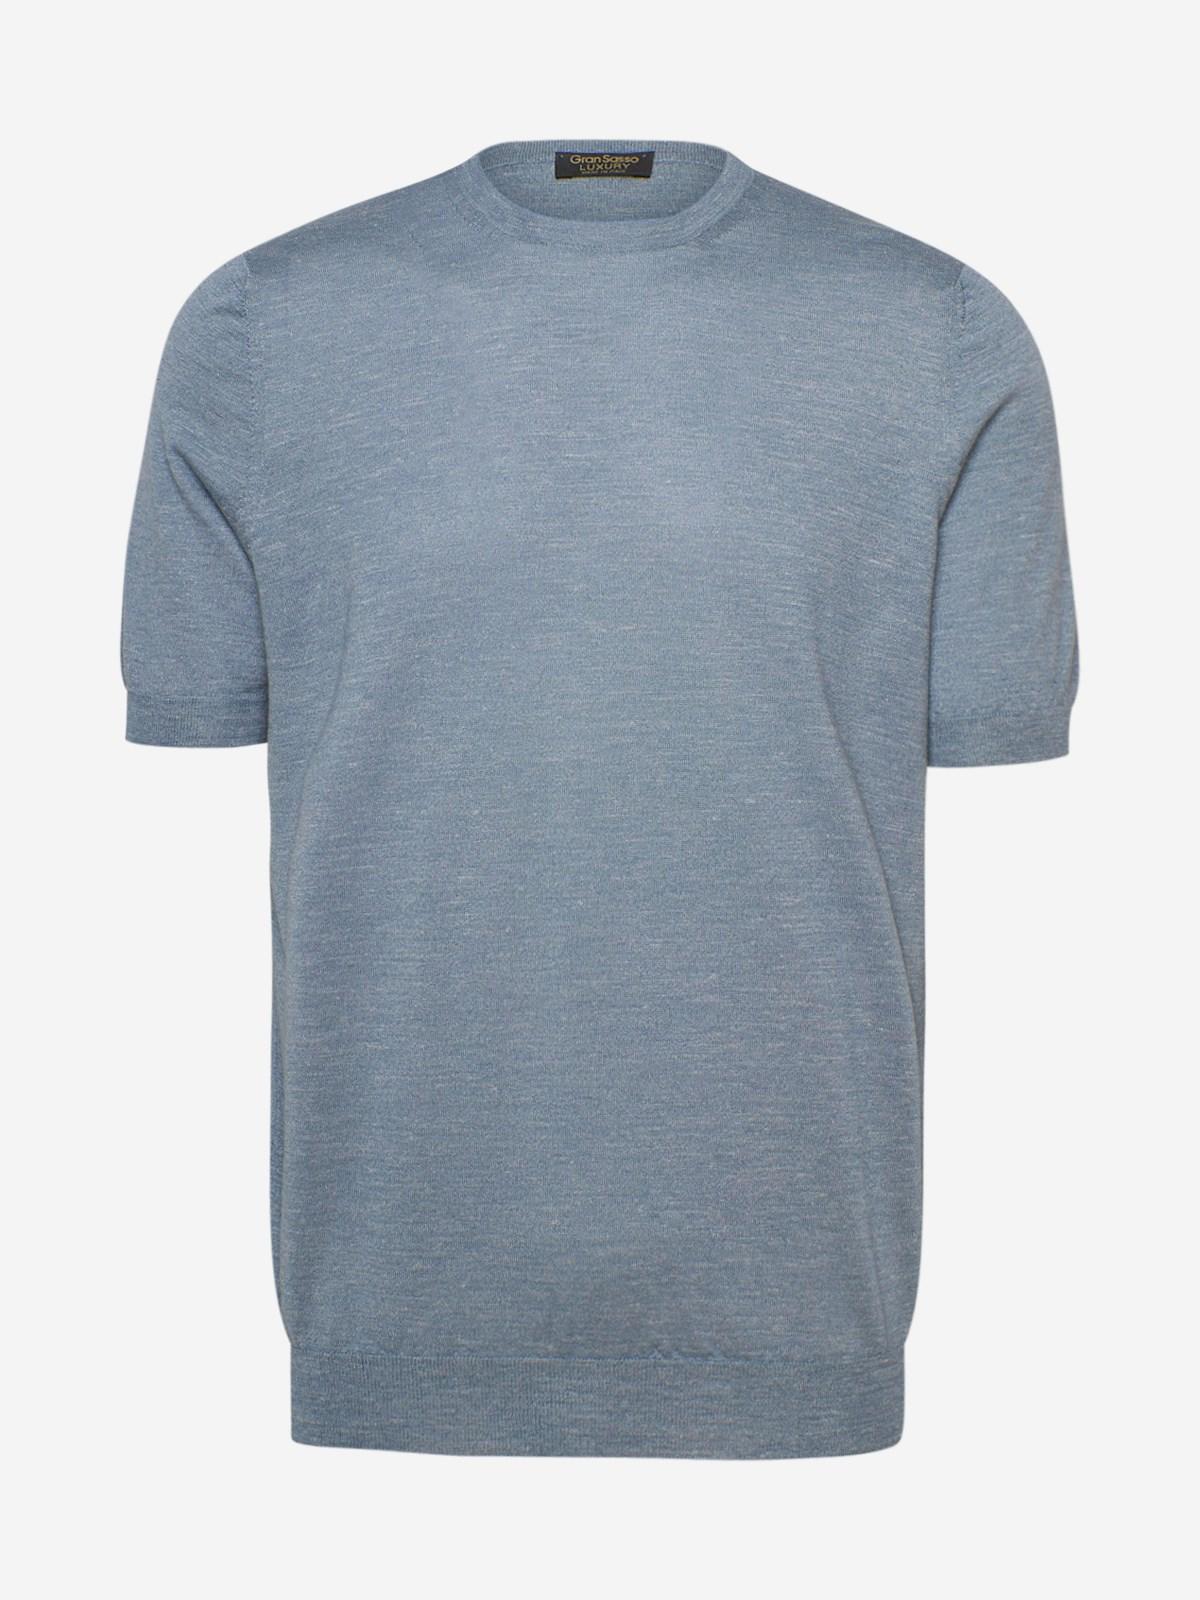 Gran Sasso T-shirts LIGHT BLUE T-SHIRT